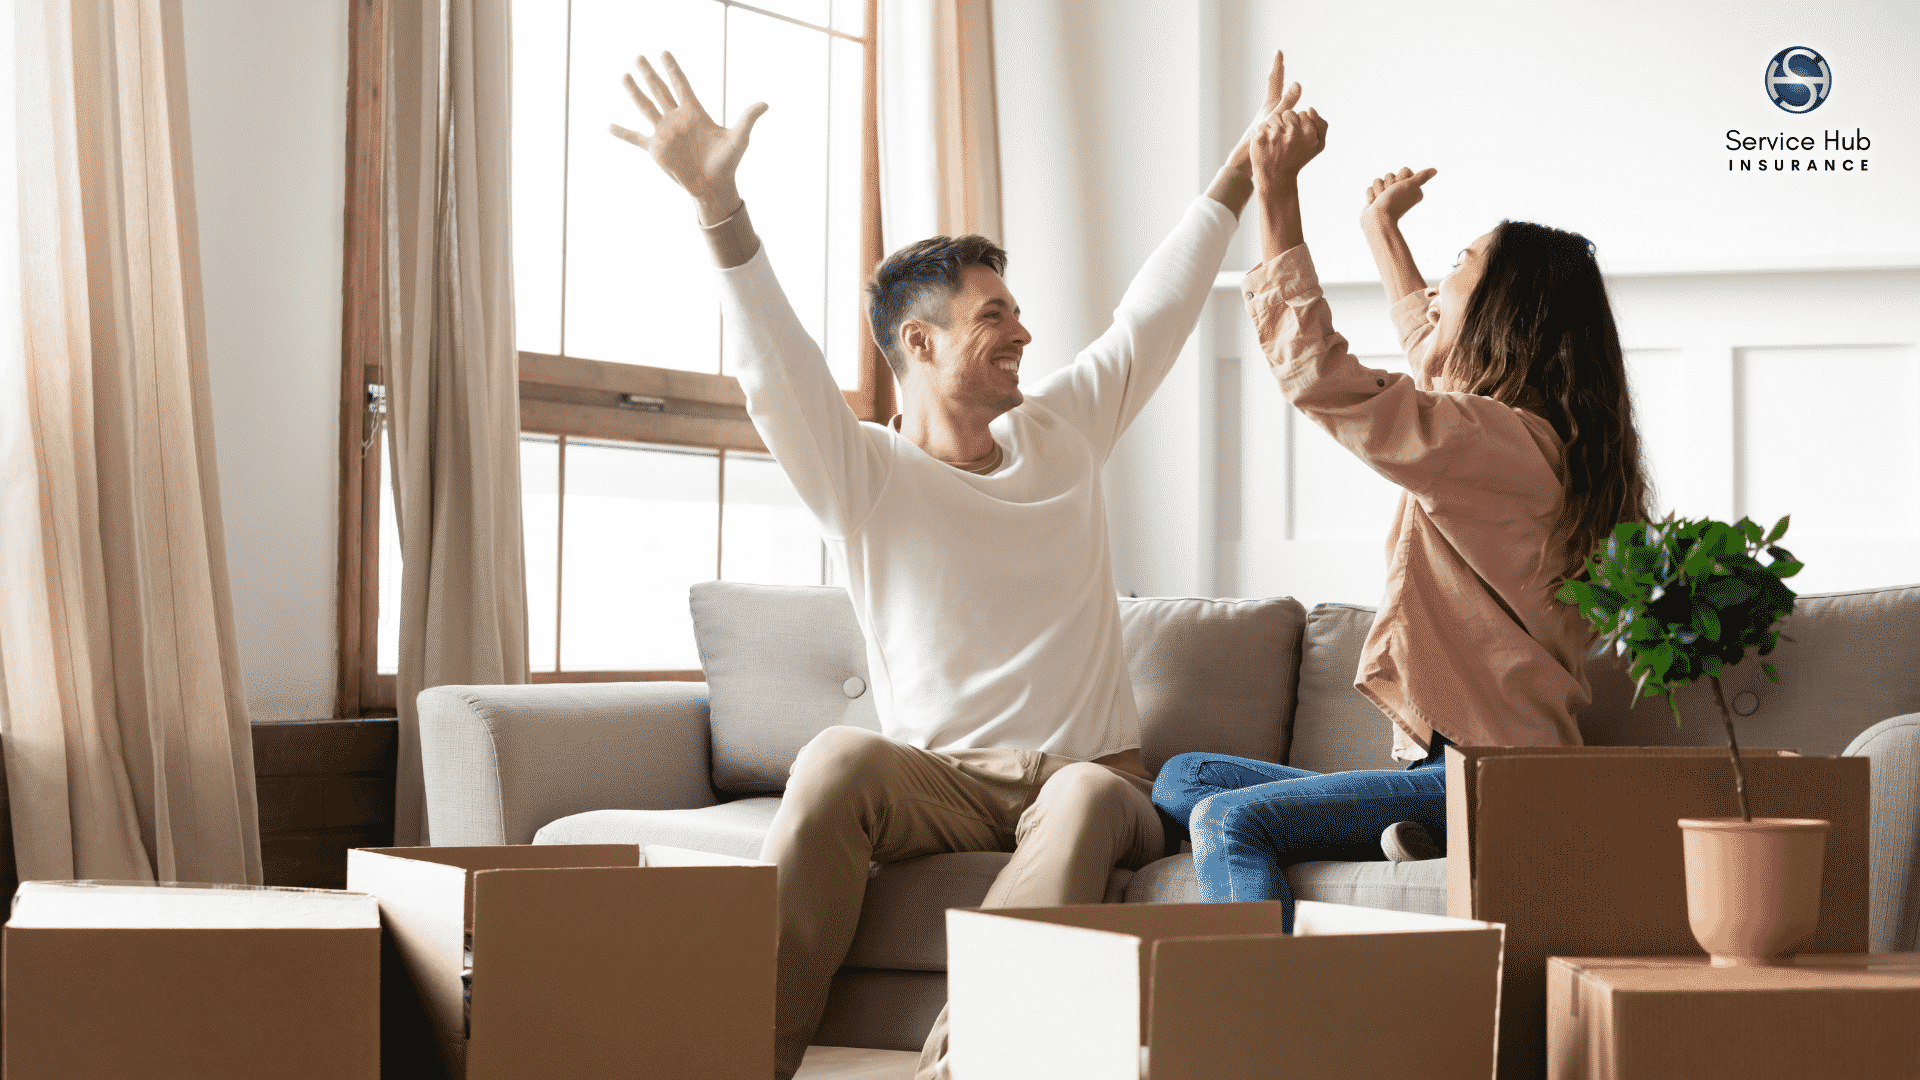 Renters Insurance - Service Hub Insurance